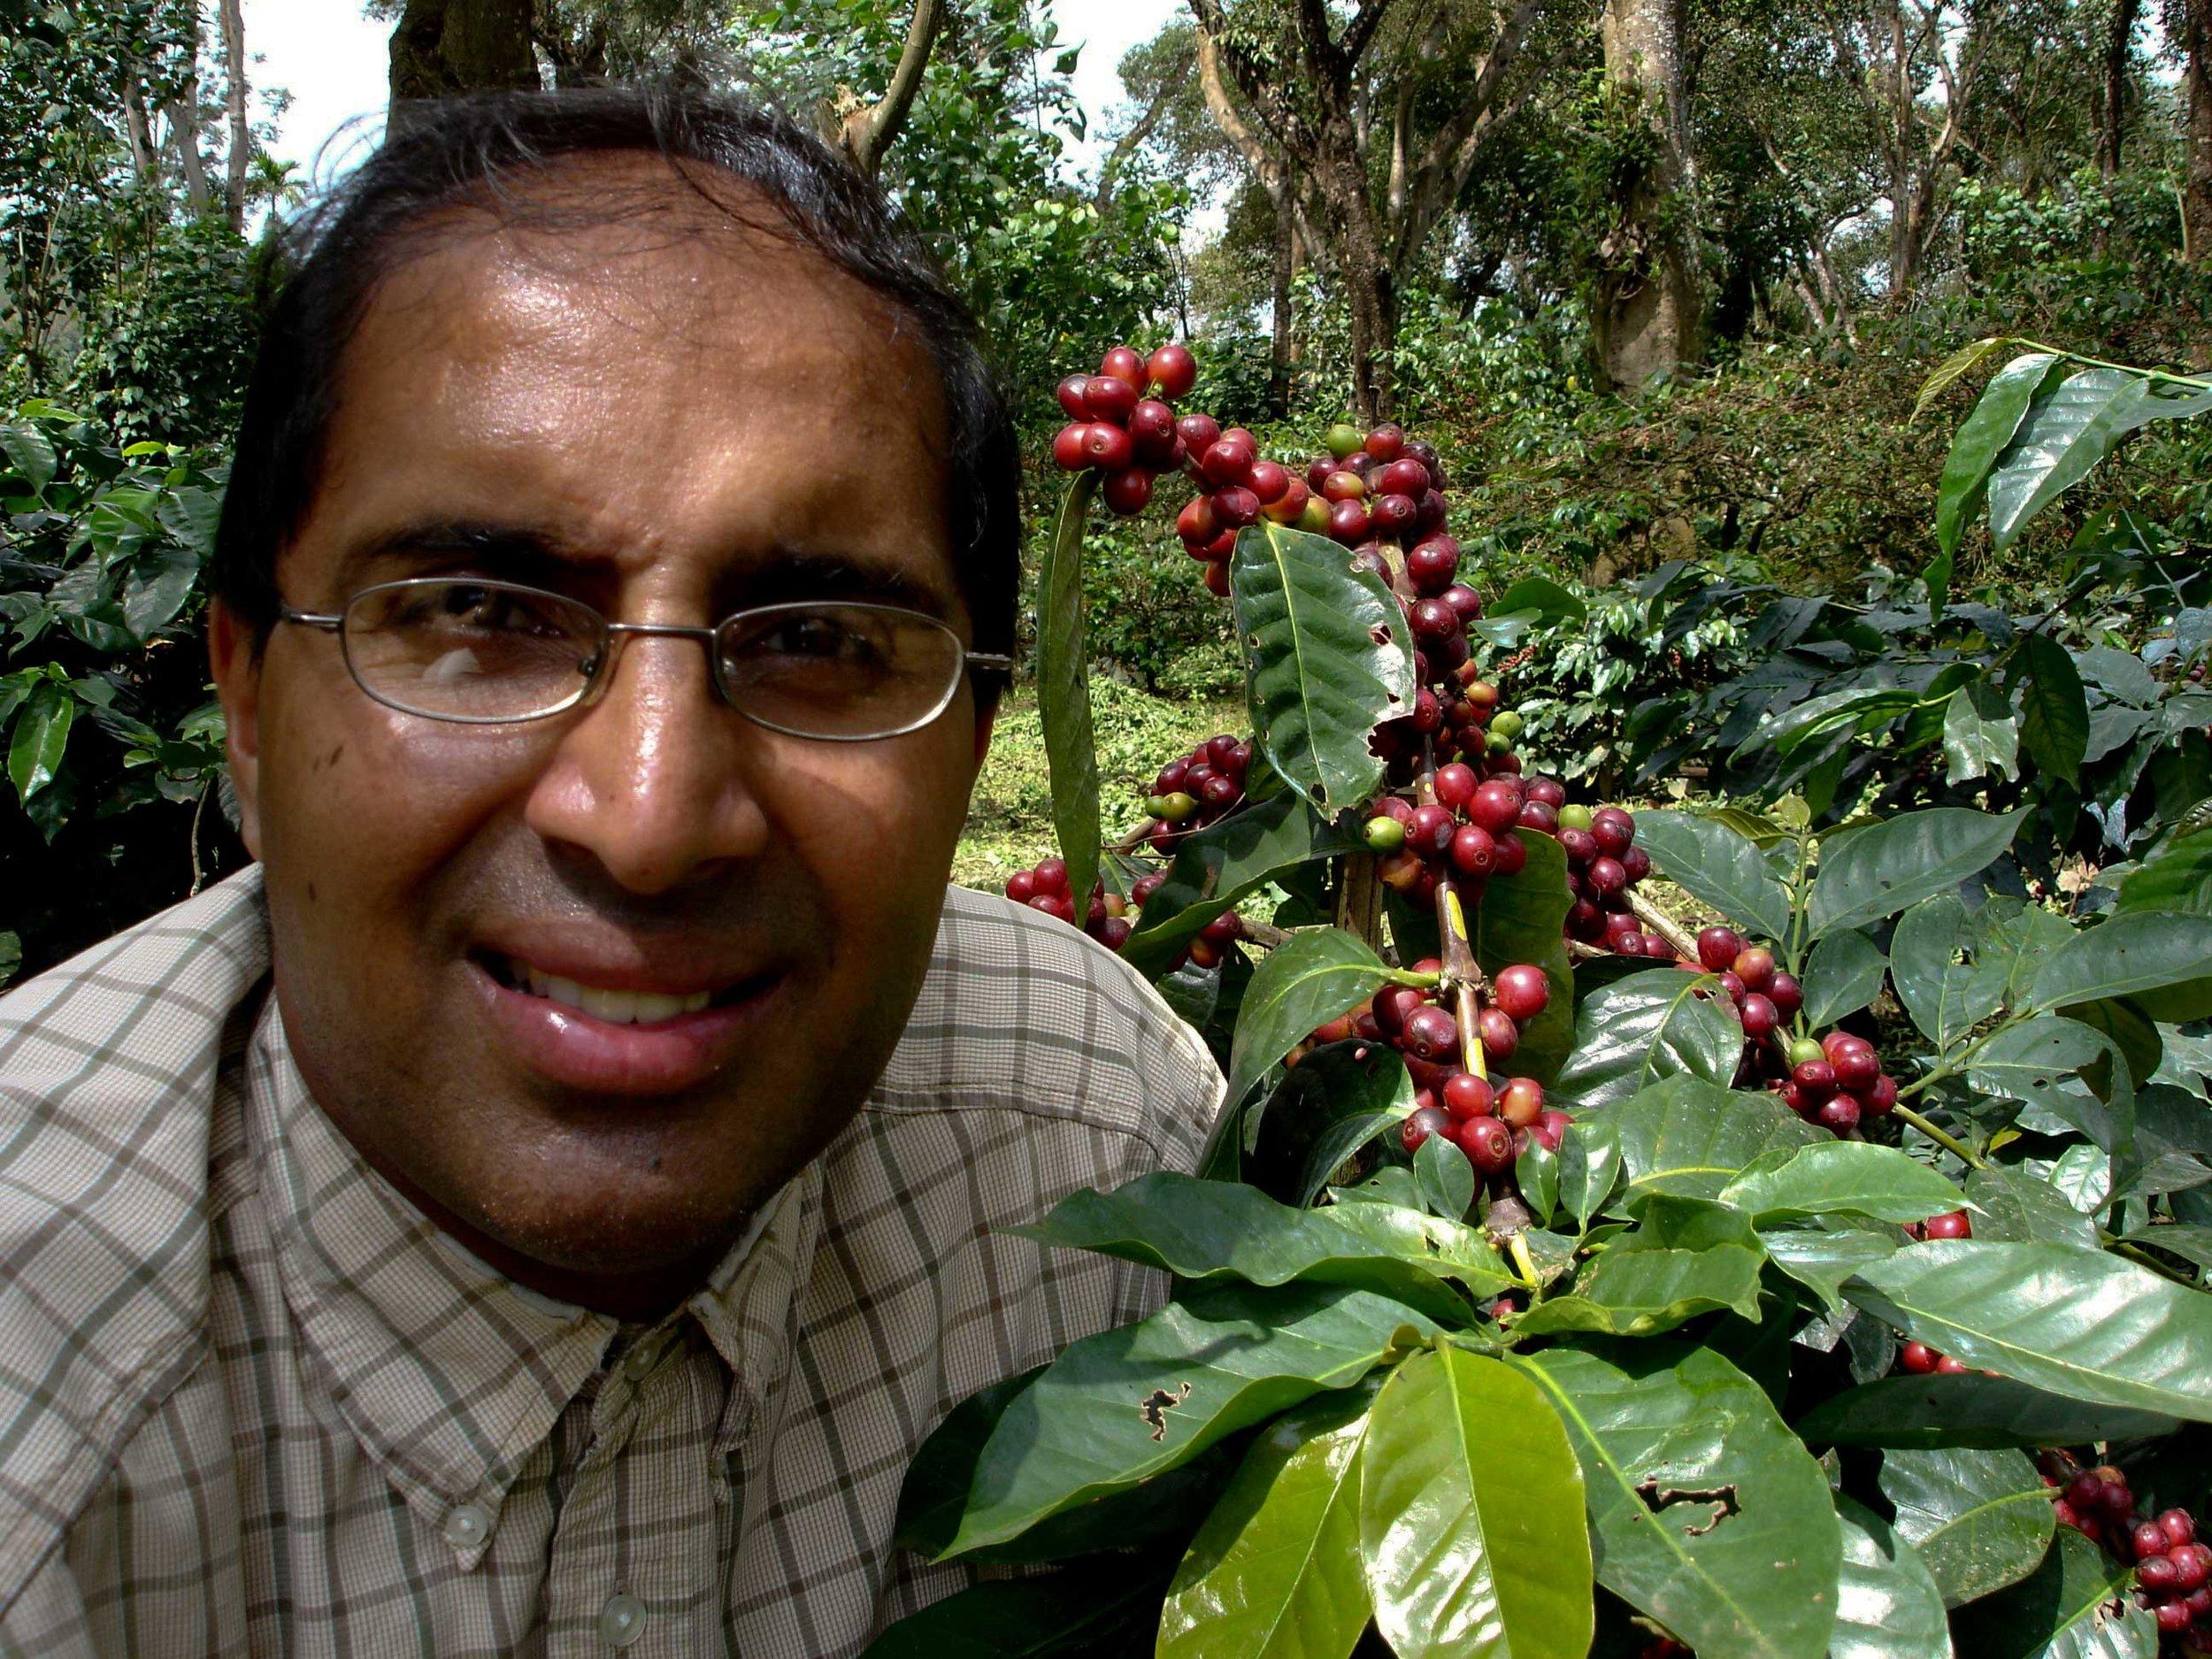 India-Bibi-Plantation-owner-Faiz-Moosakutty.jpg